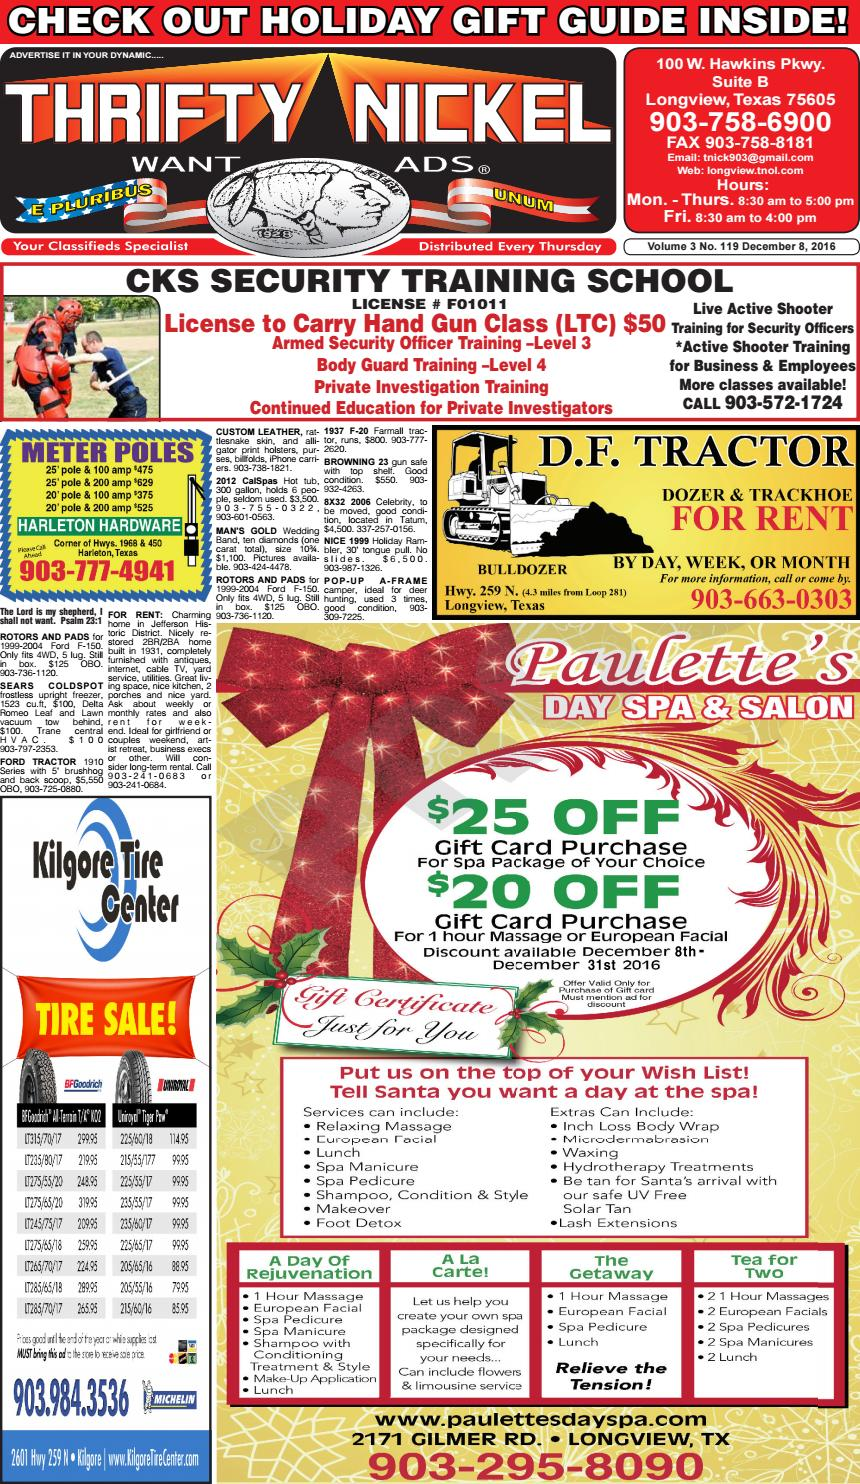 12 8 16 longview edition by Longview Thrifty Nickel - issuu